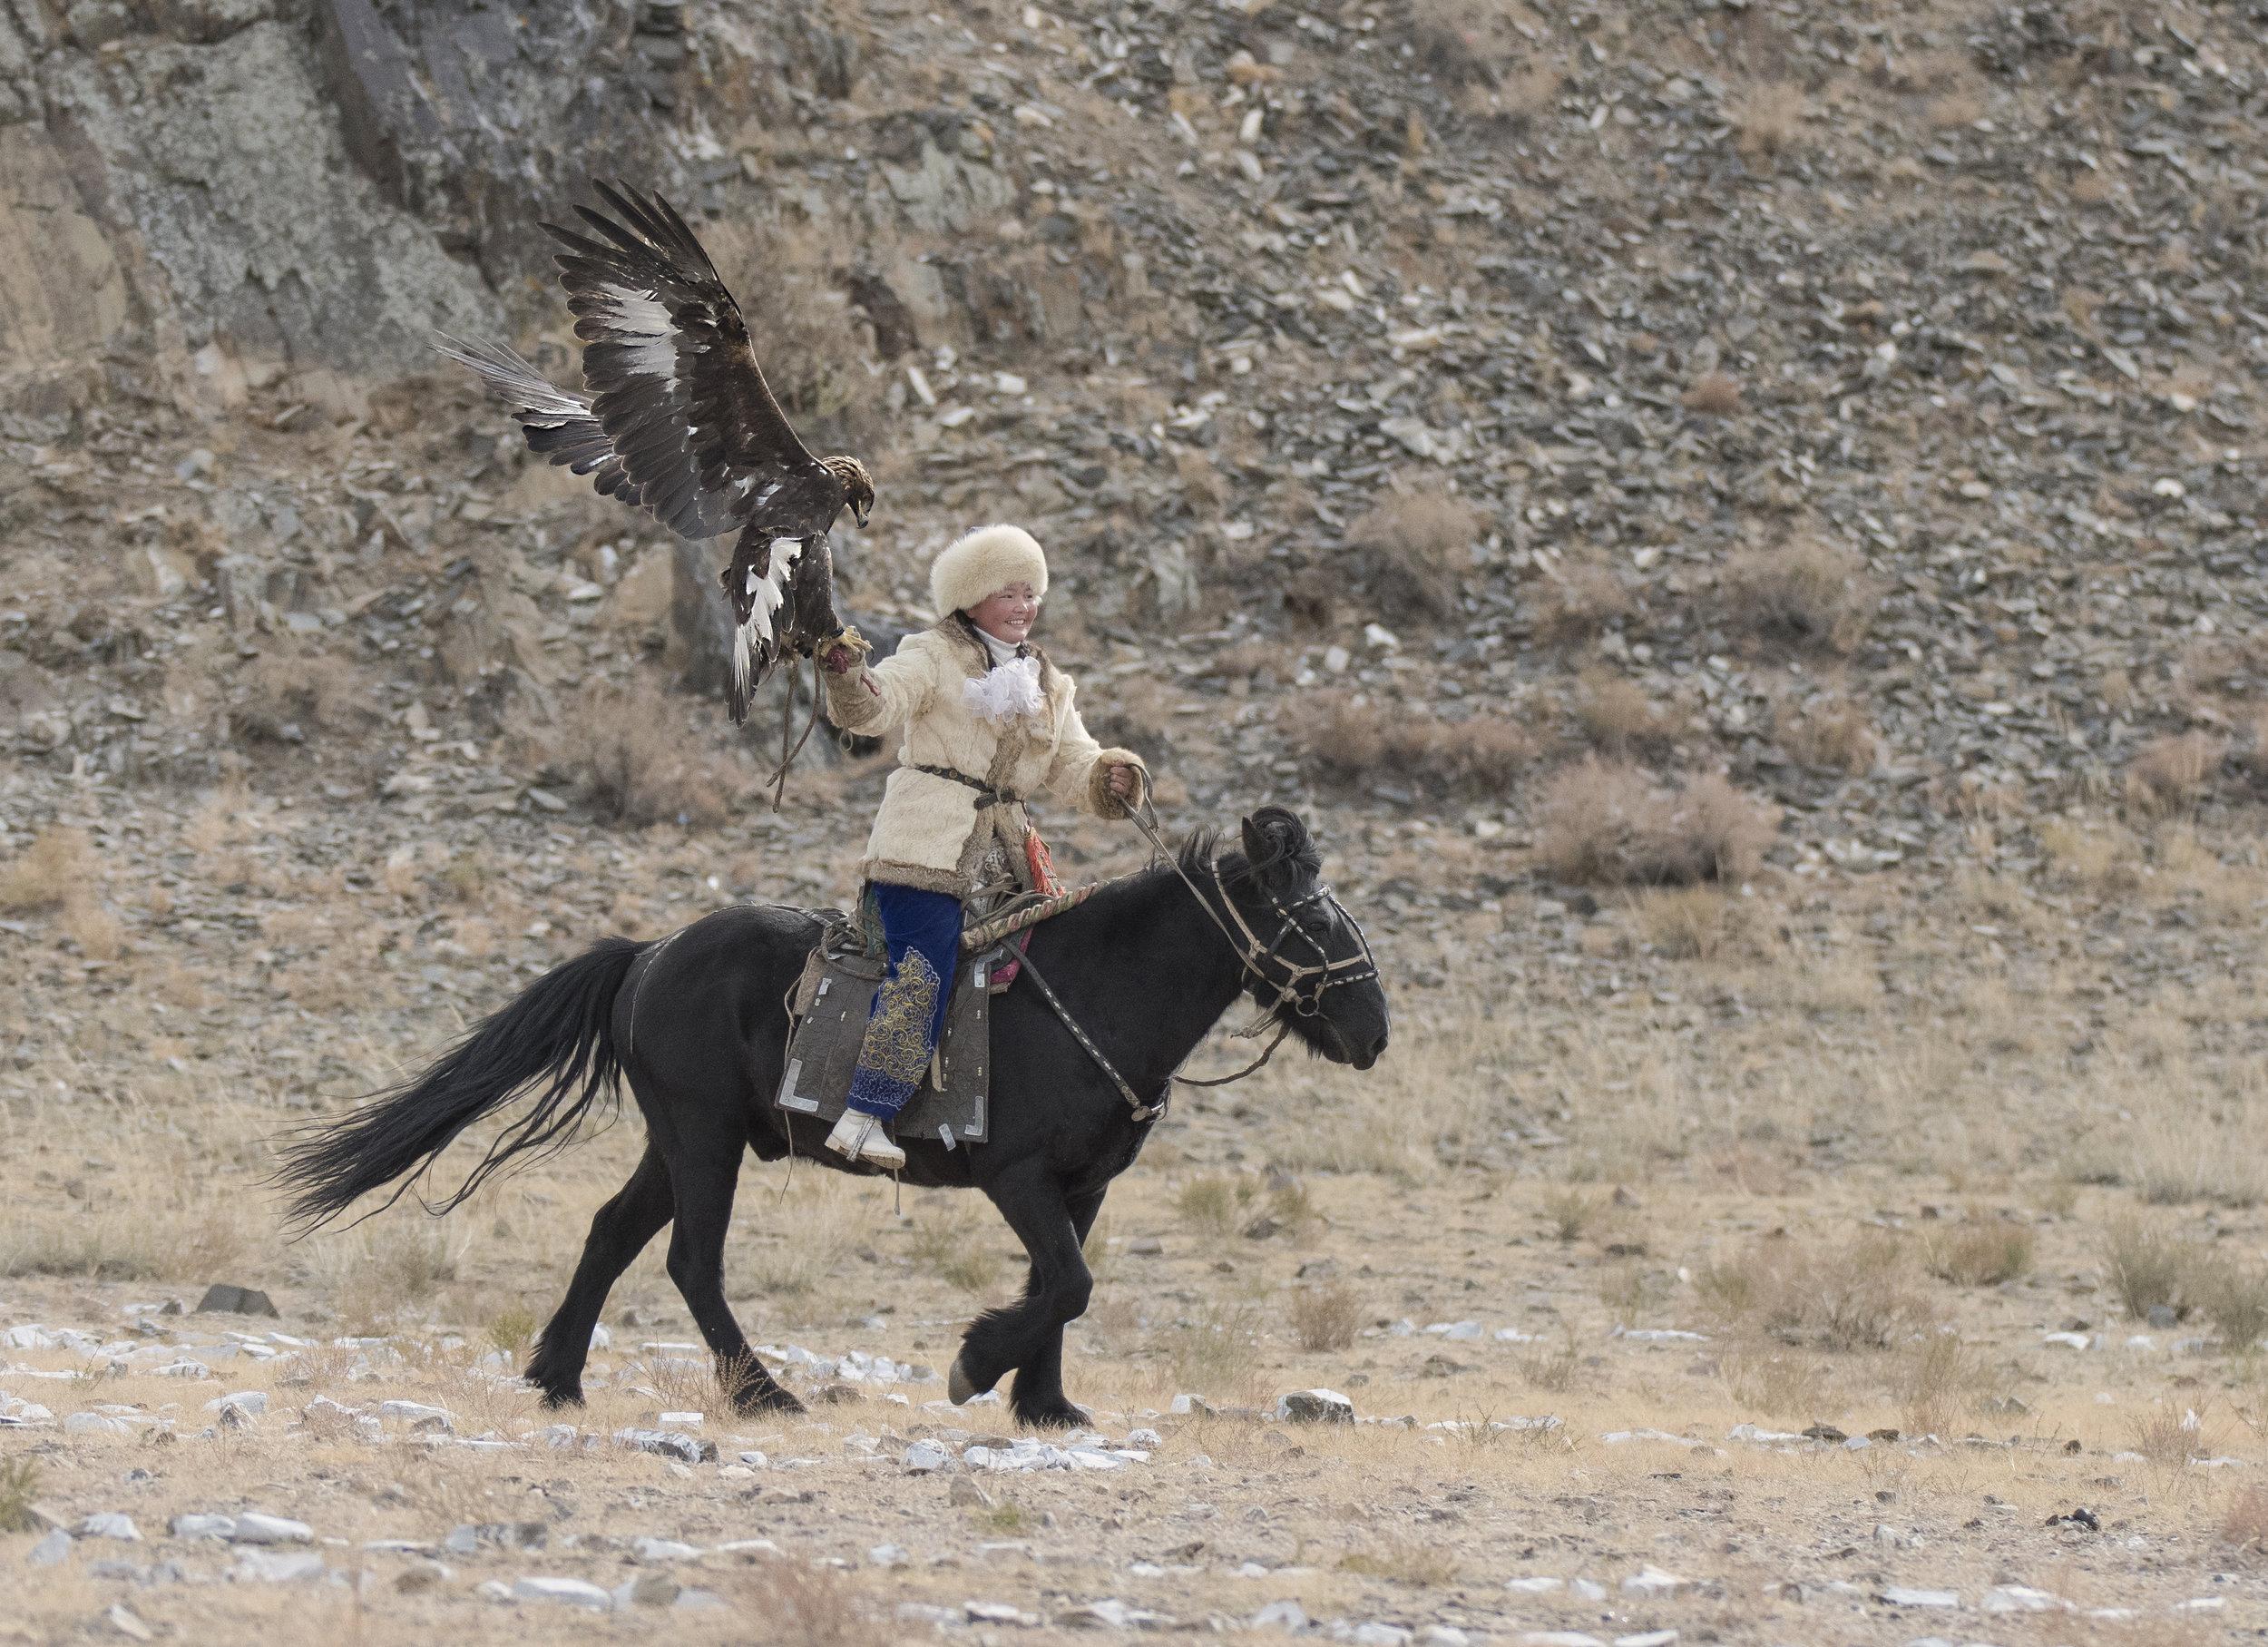 eagle huntress catches her eagle.jpg